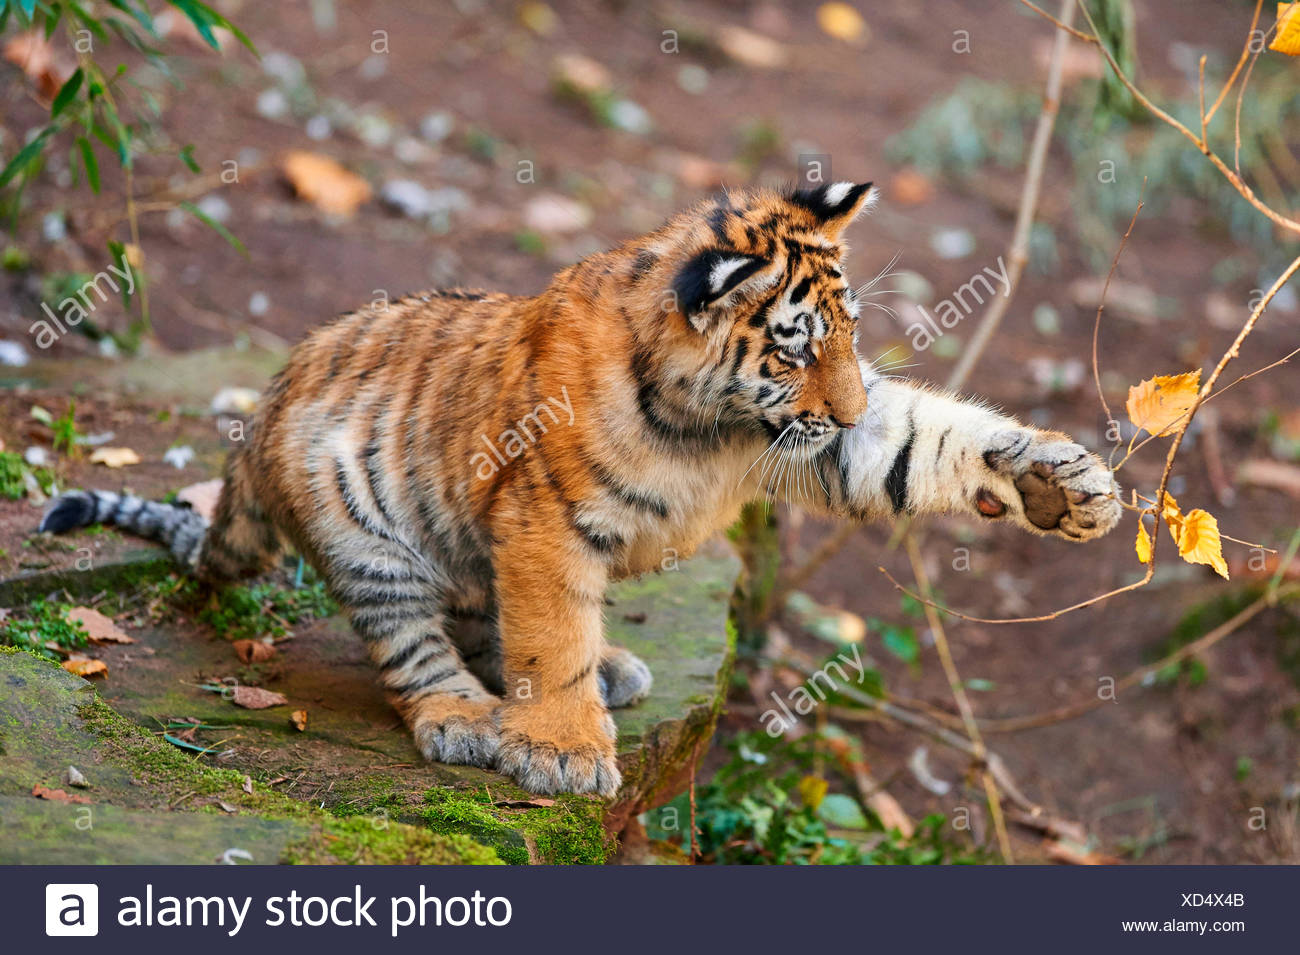 Tigre Siberiana, Amurian tiger (Panthera tigris altaica), tiger cub giocando con un ramoscello Immagini Stock